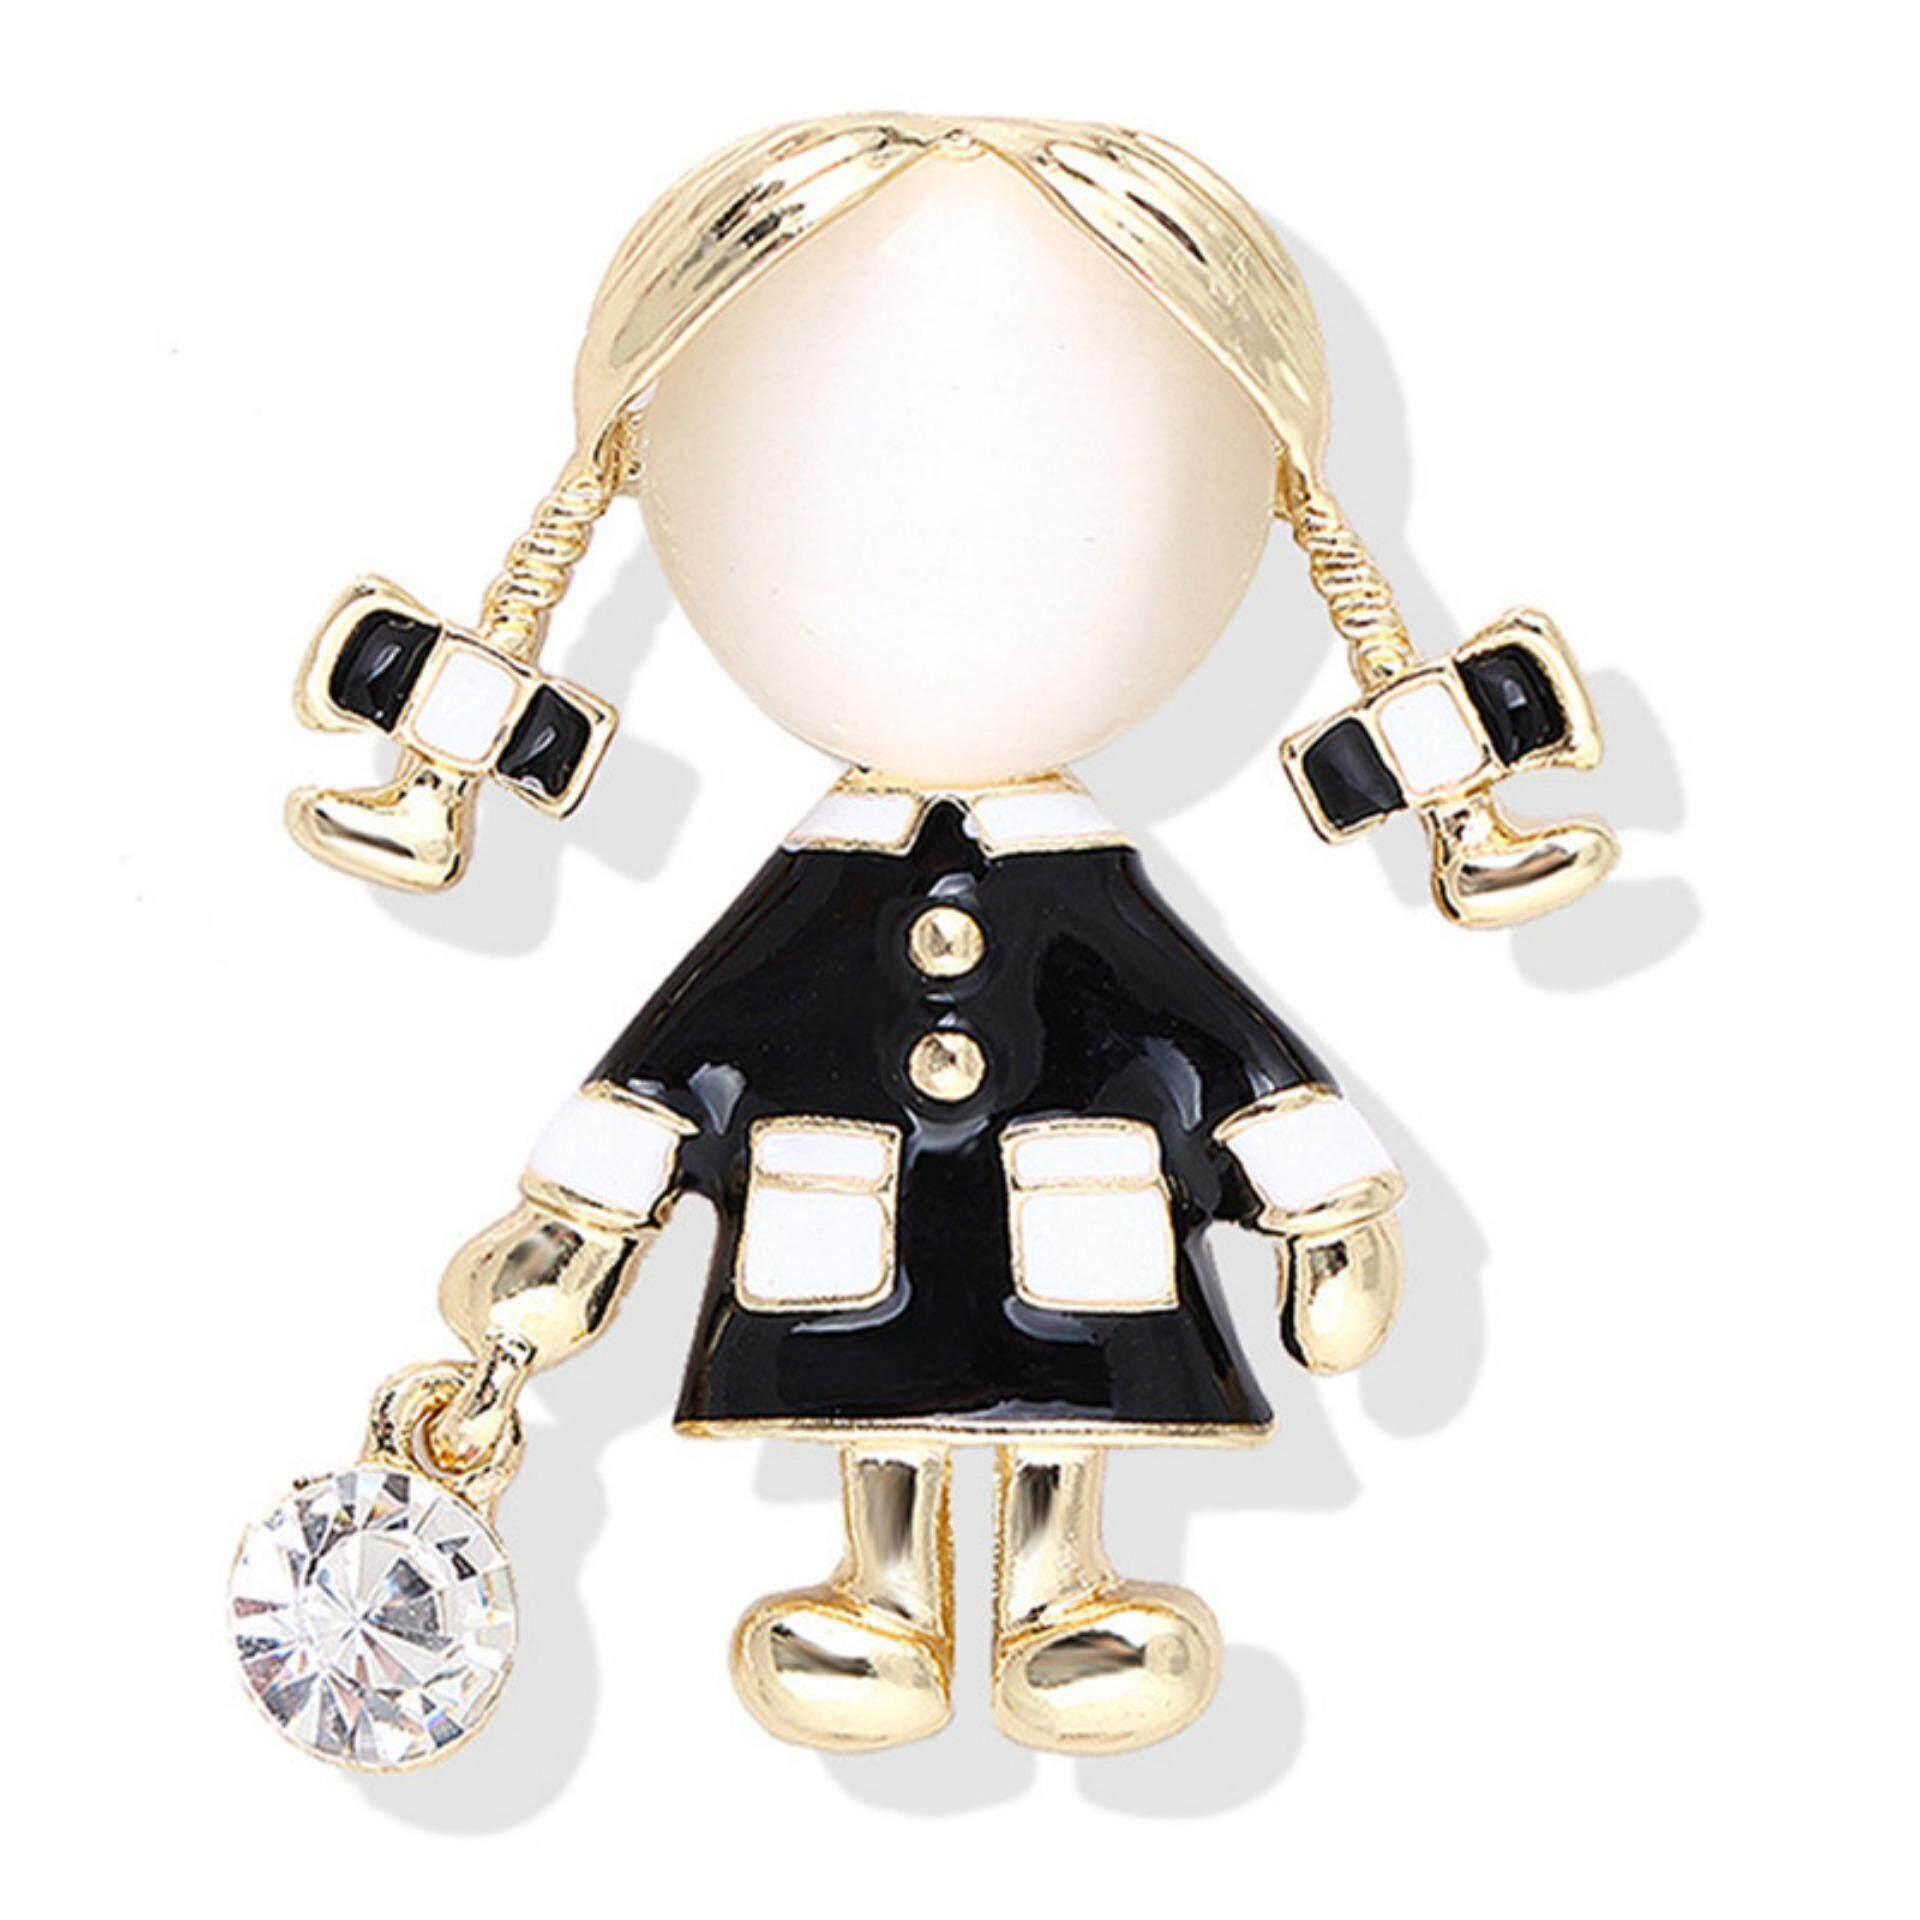 Gadis Kecil Bros Wanita Berlian Tiruan Opal Bros Kristal Pin Gaun Mantel Hadiah Perhiasan By Buy Tra.